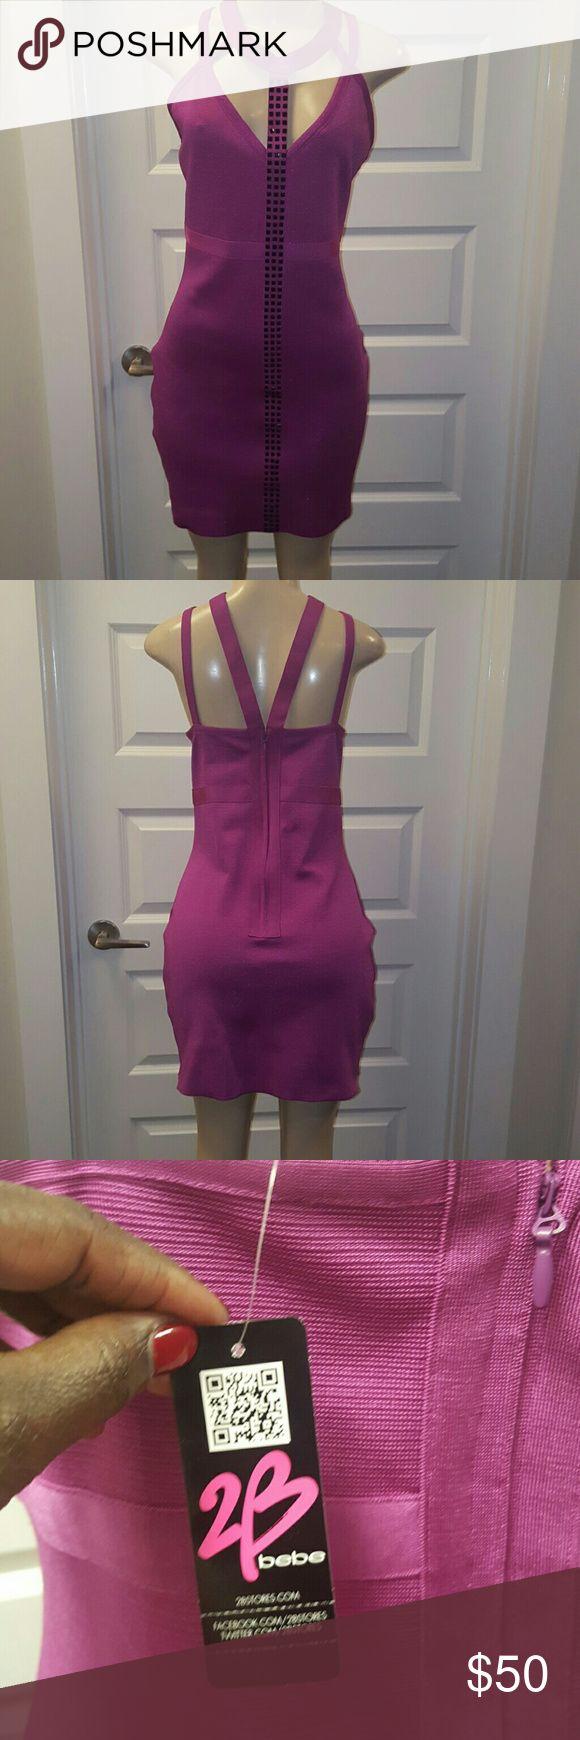 Brand NEW Pink purple bandage studded dress Brand new pink purple bandage dress with black studs/rhinestones down the middle bebe Dresses